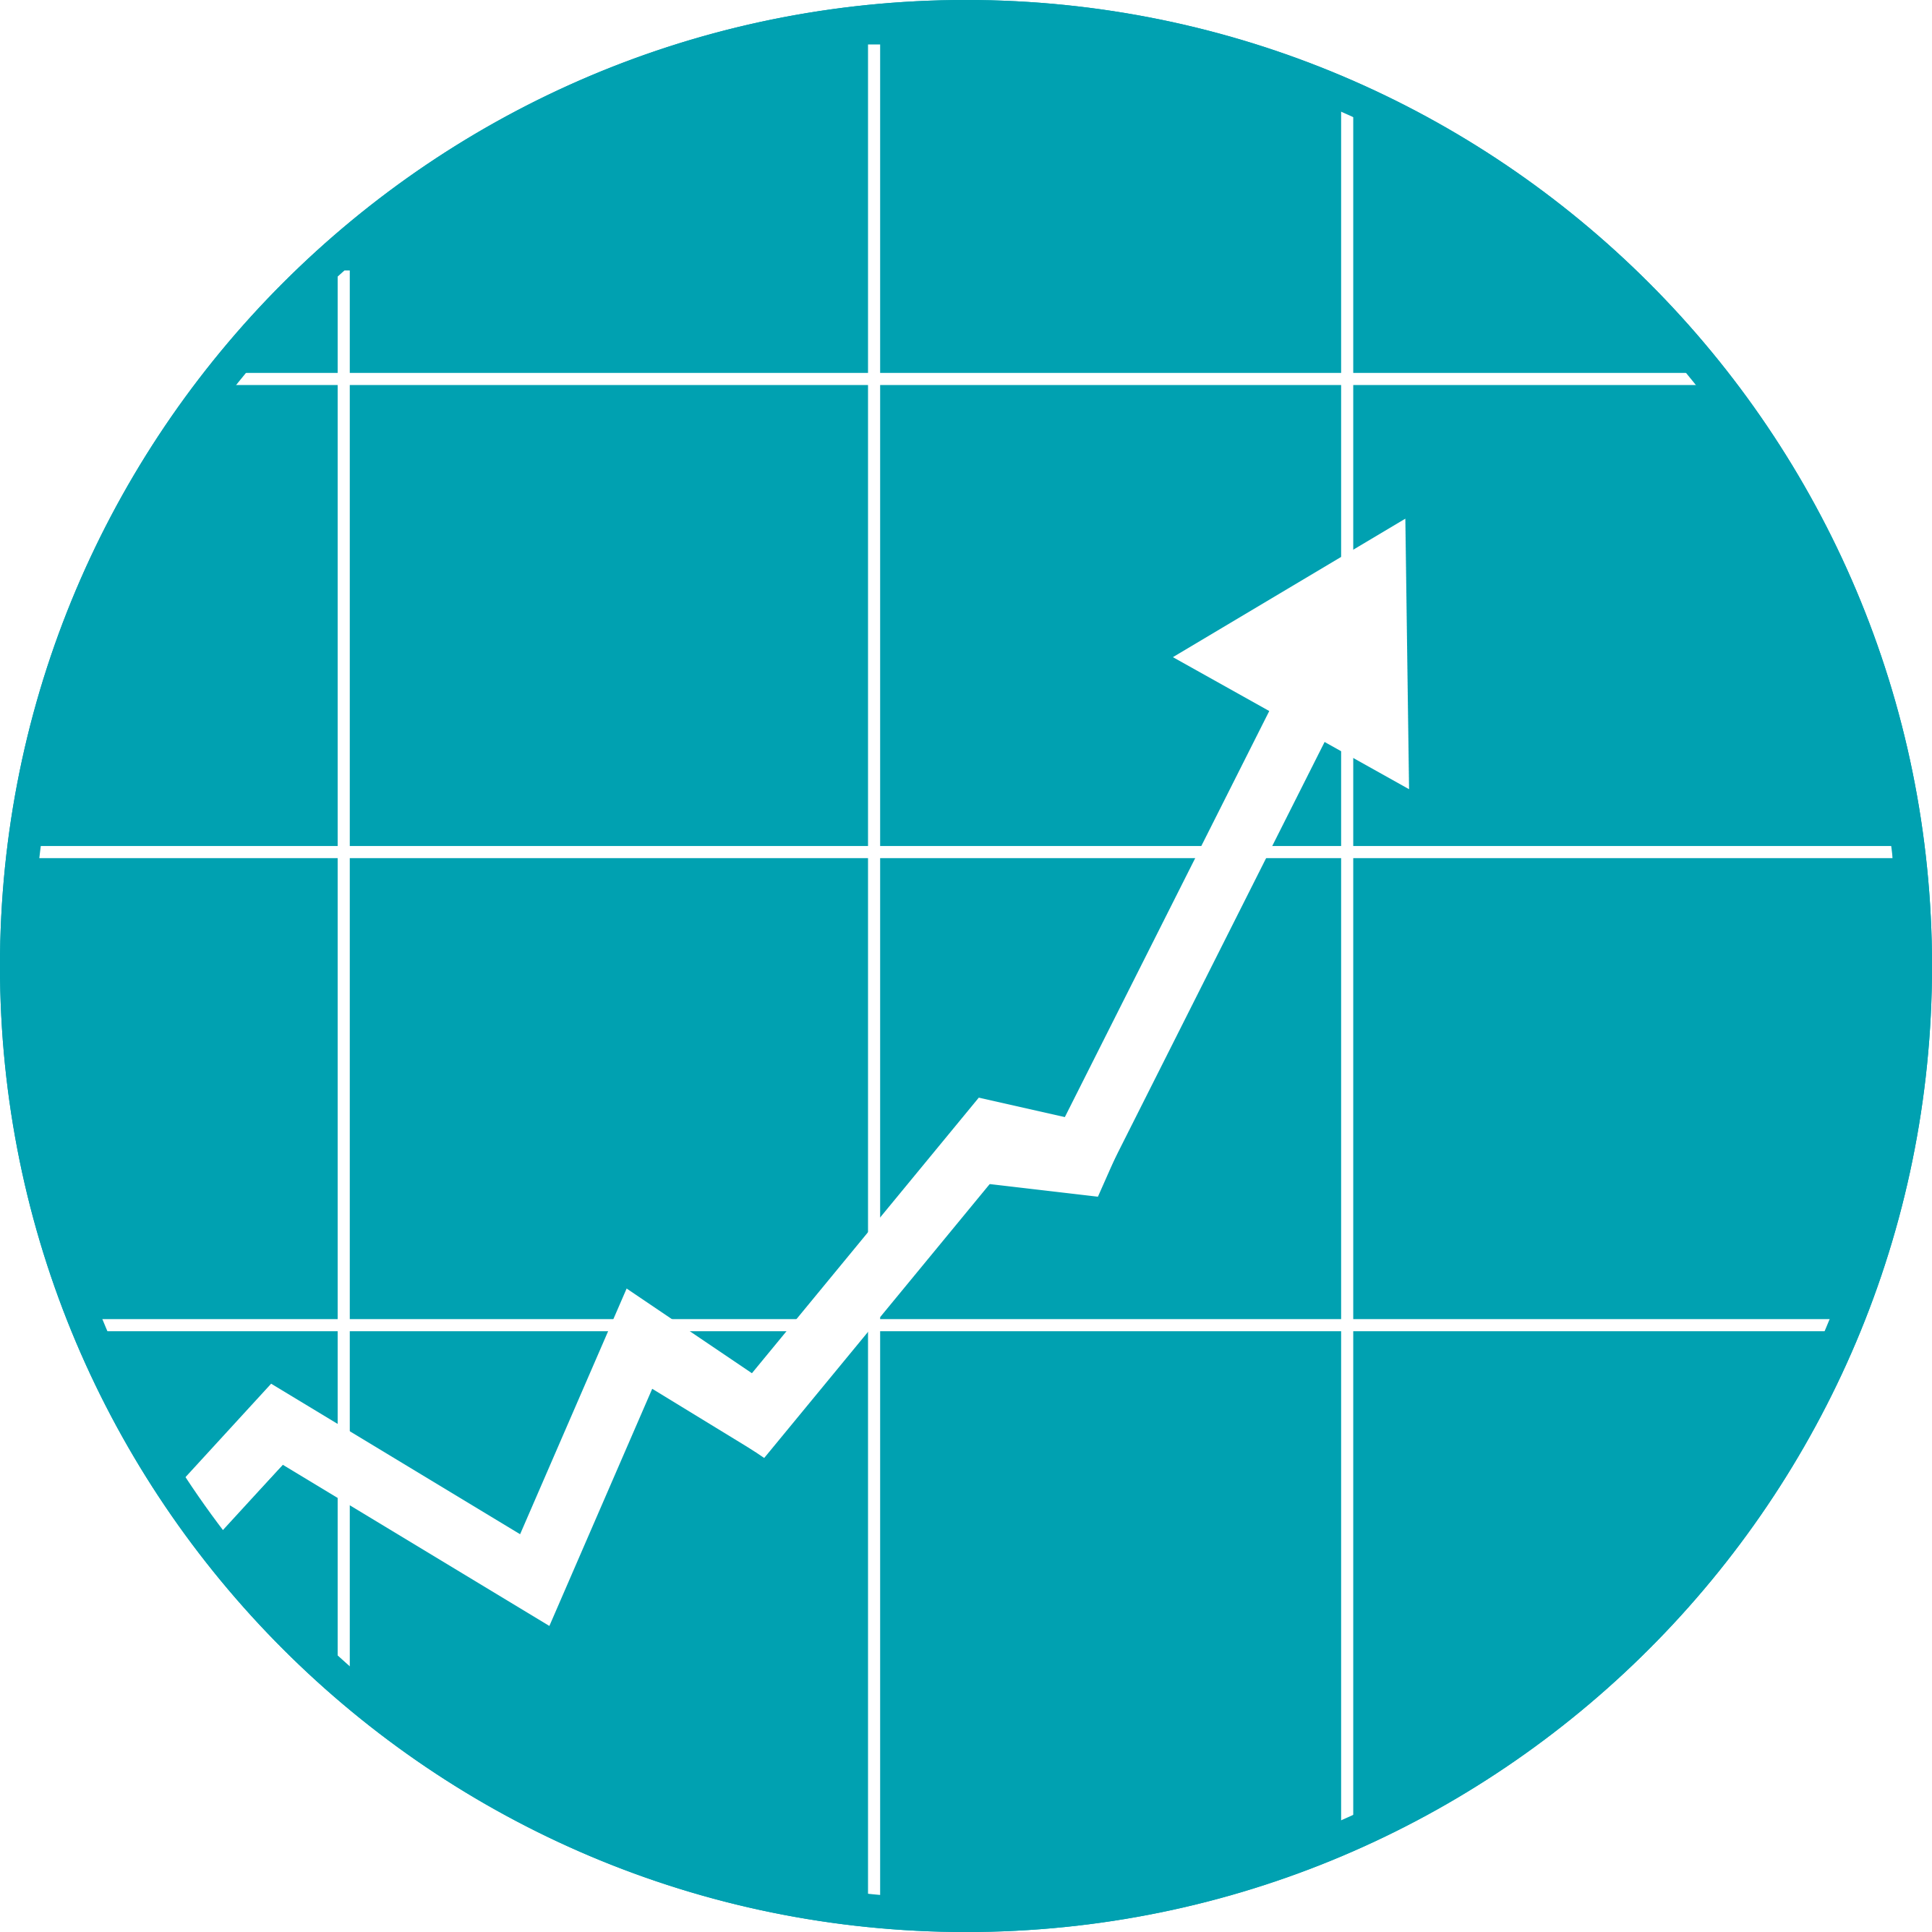 Hq png transparent images. Statistics clipart stock market graph